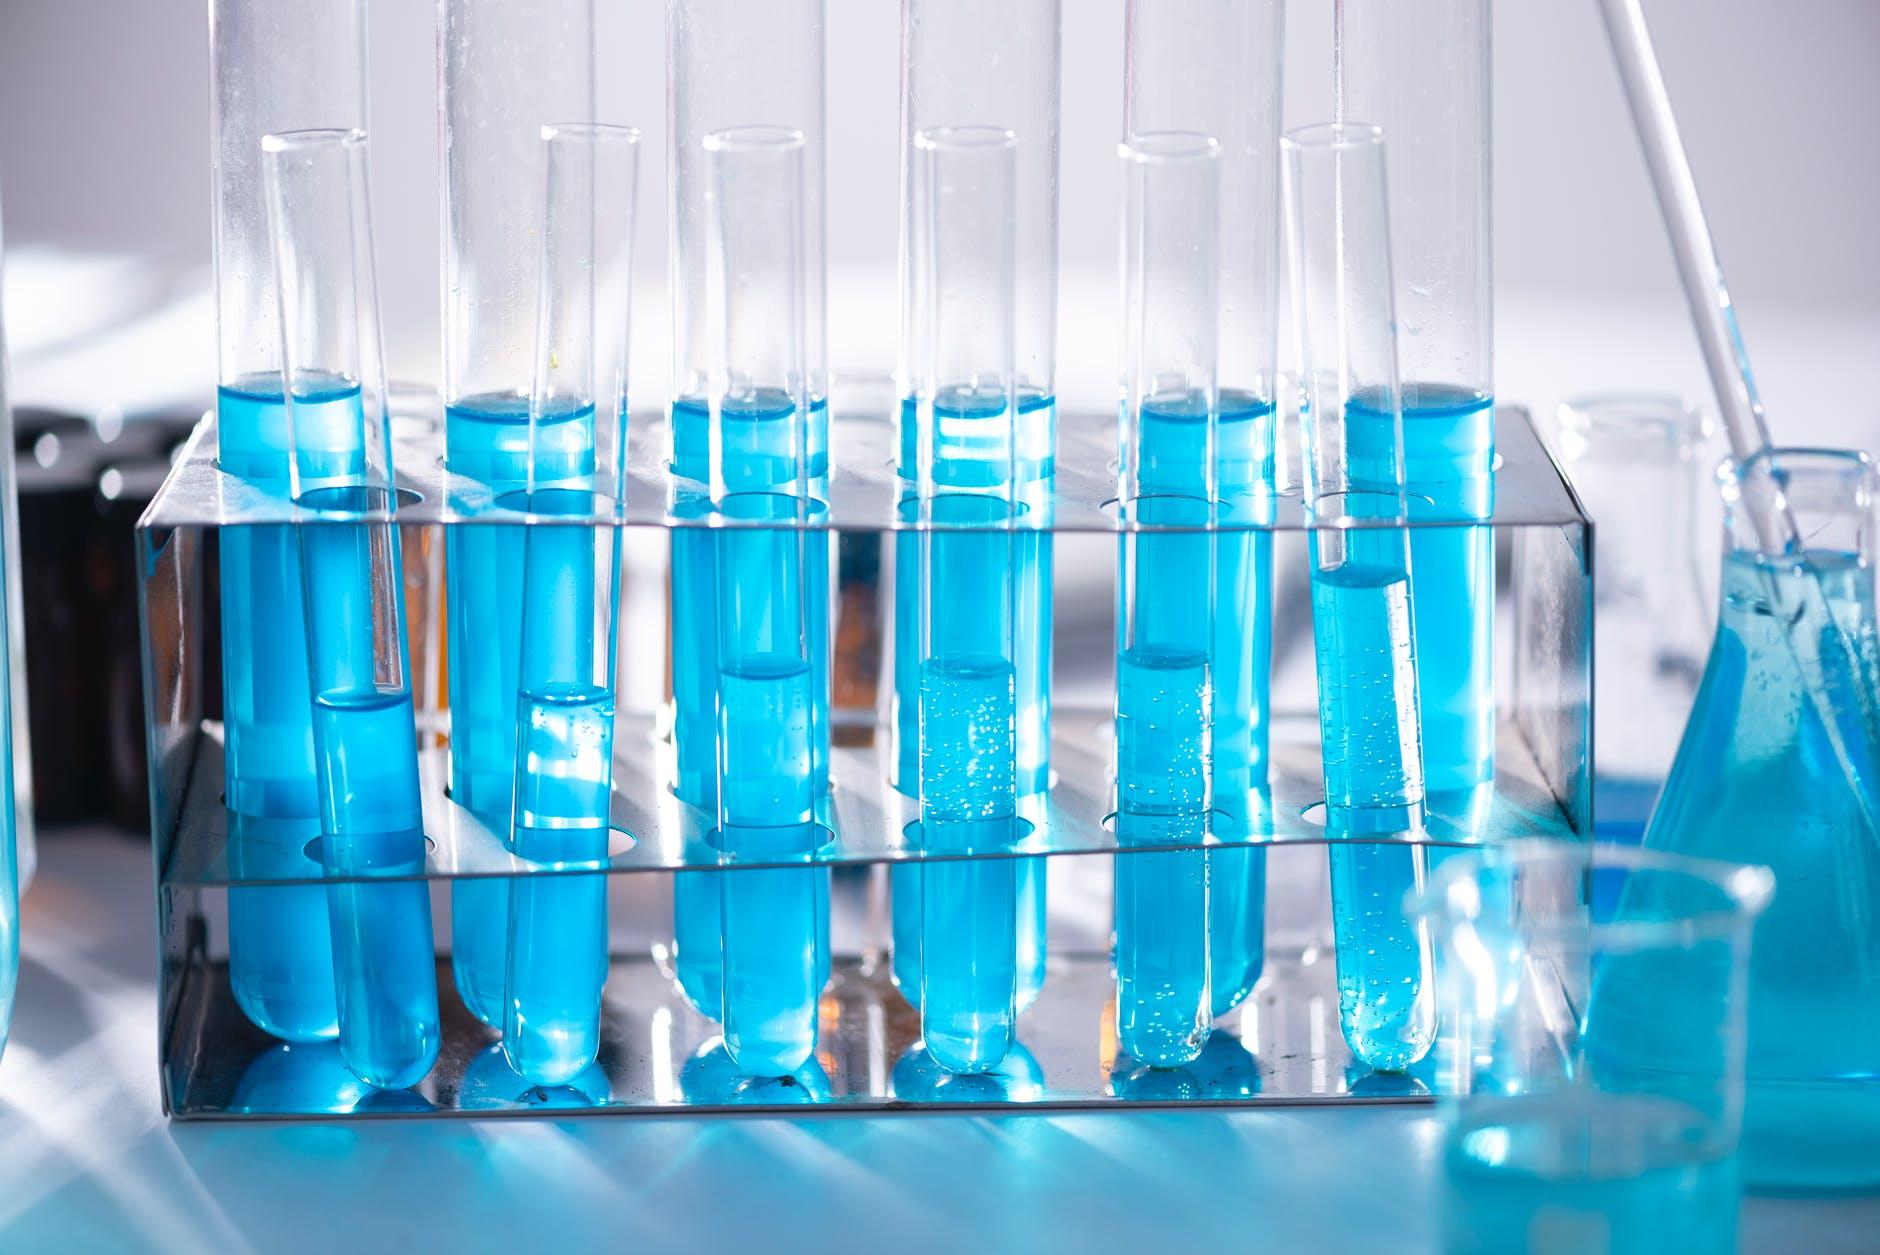 Artelo Biosciences ARTL Stock News